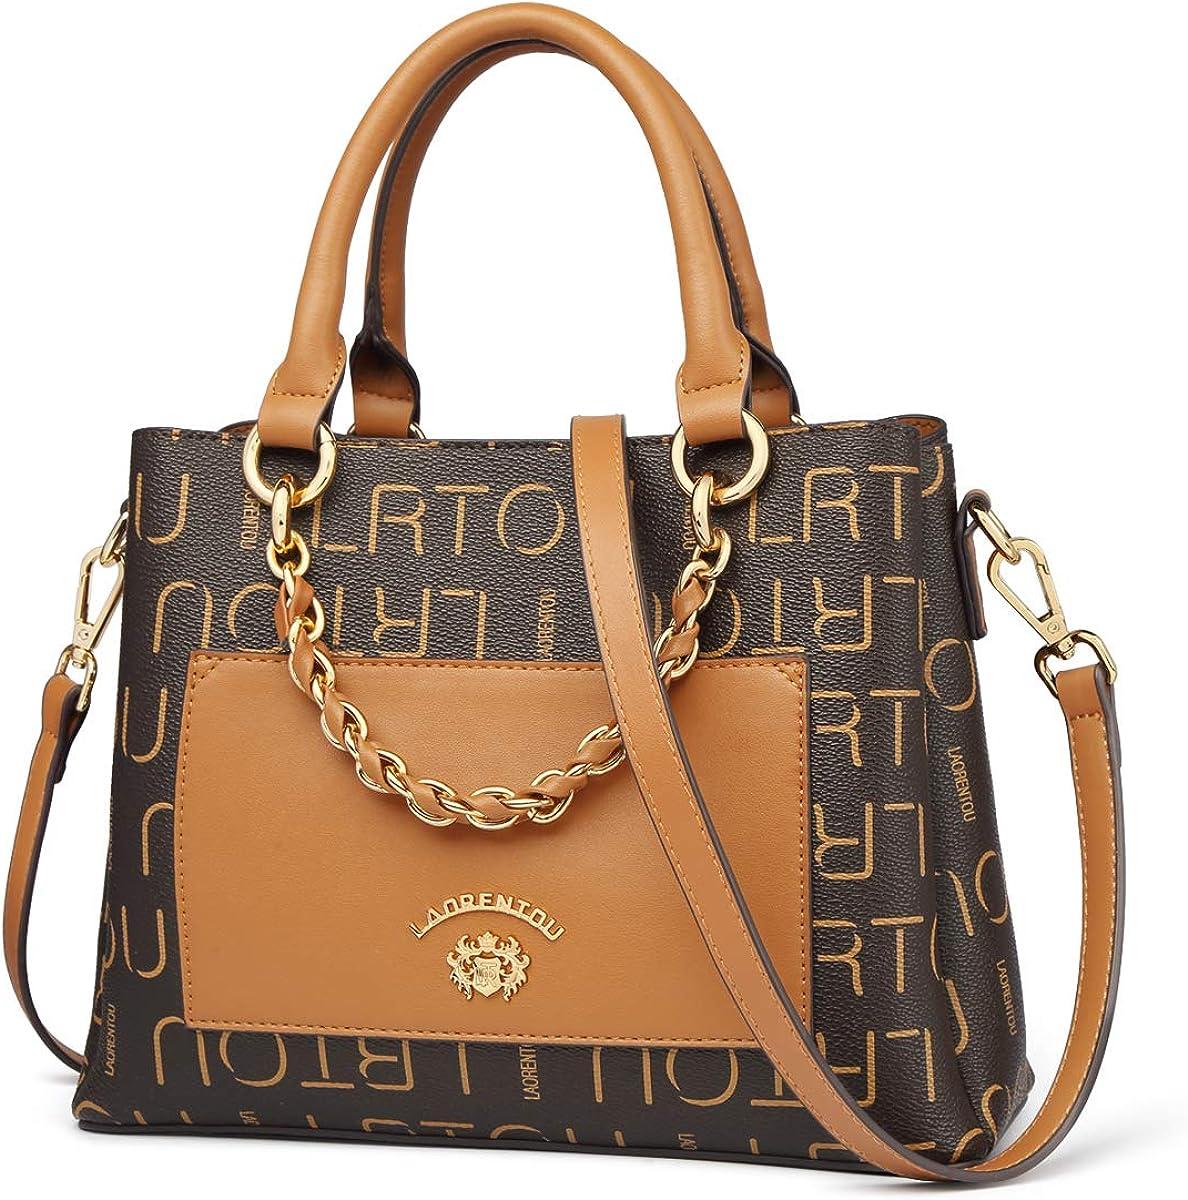 Max 44% OFF LAORENTOU PVC Women's Signature Checkered OFFicial mail order Purses Handbags